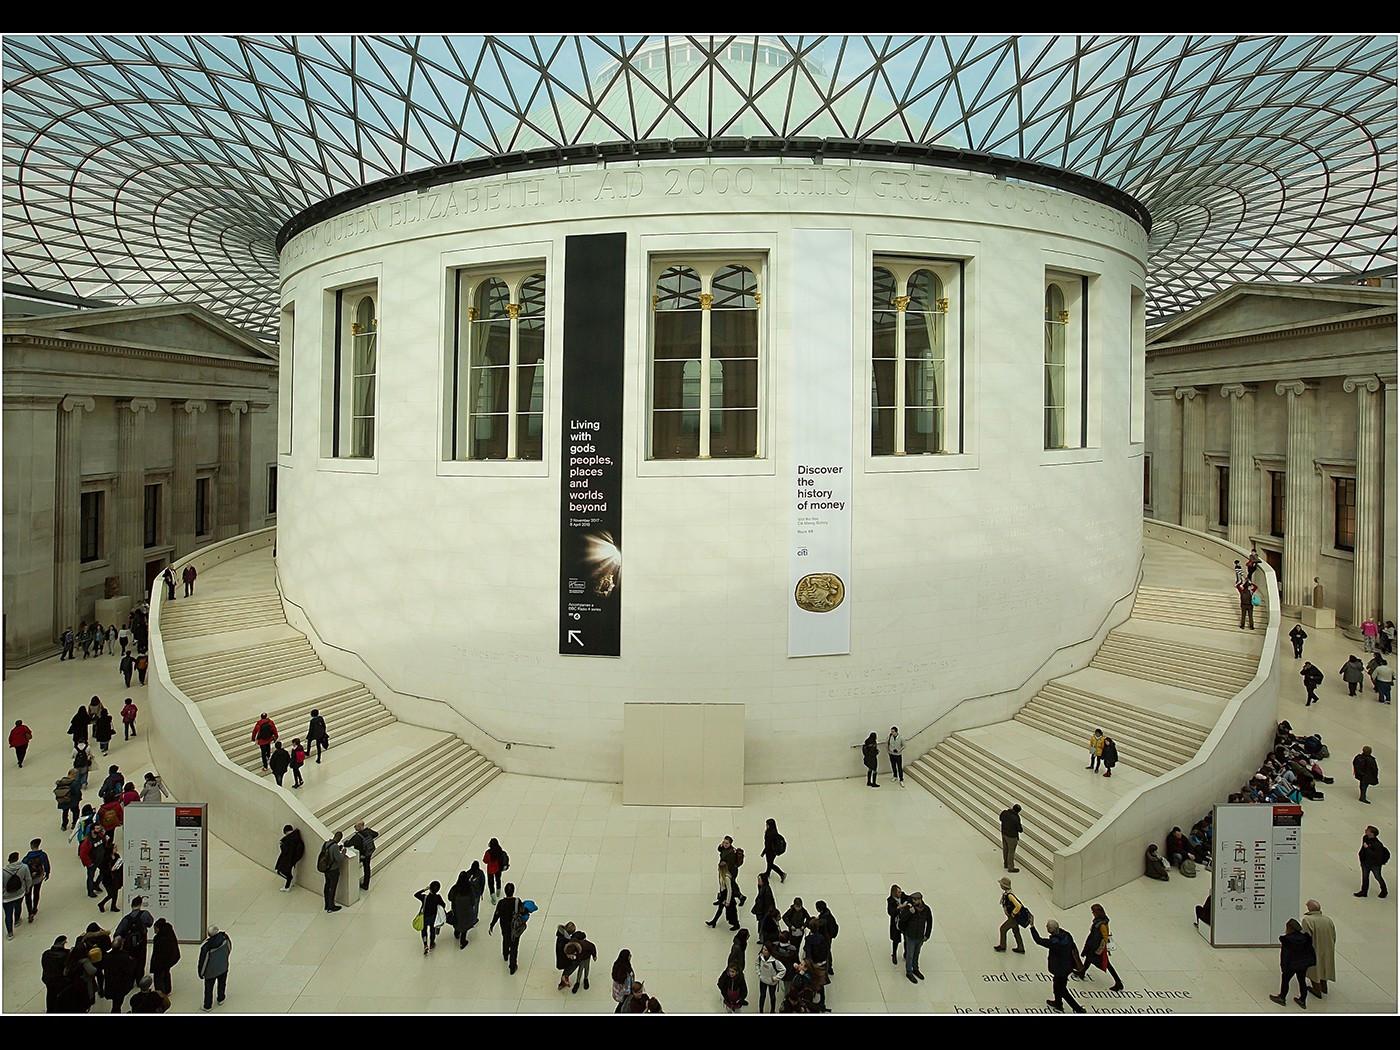 British Museum London - A Popular Tourist Attraction